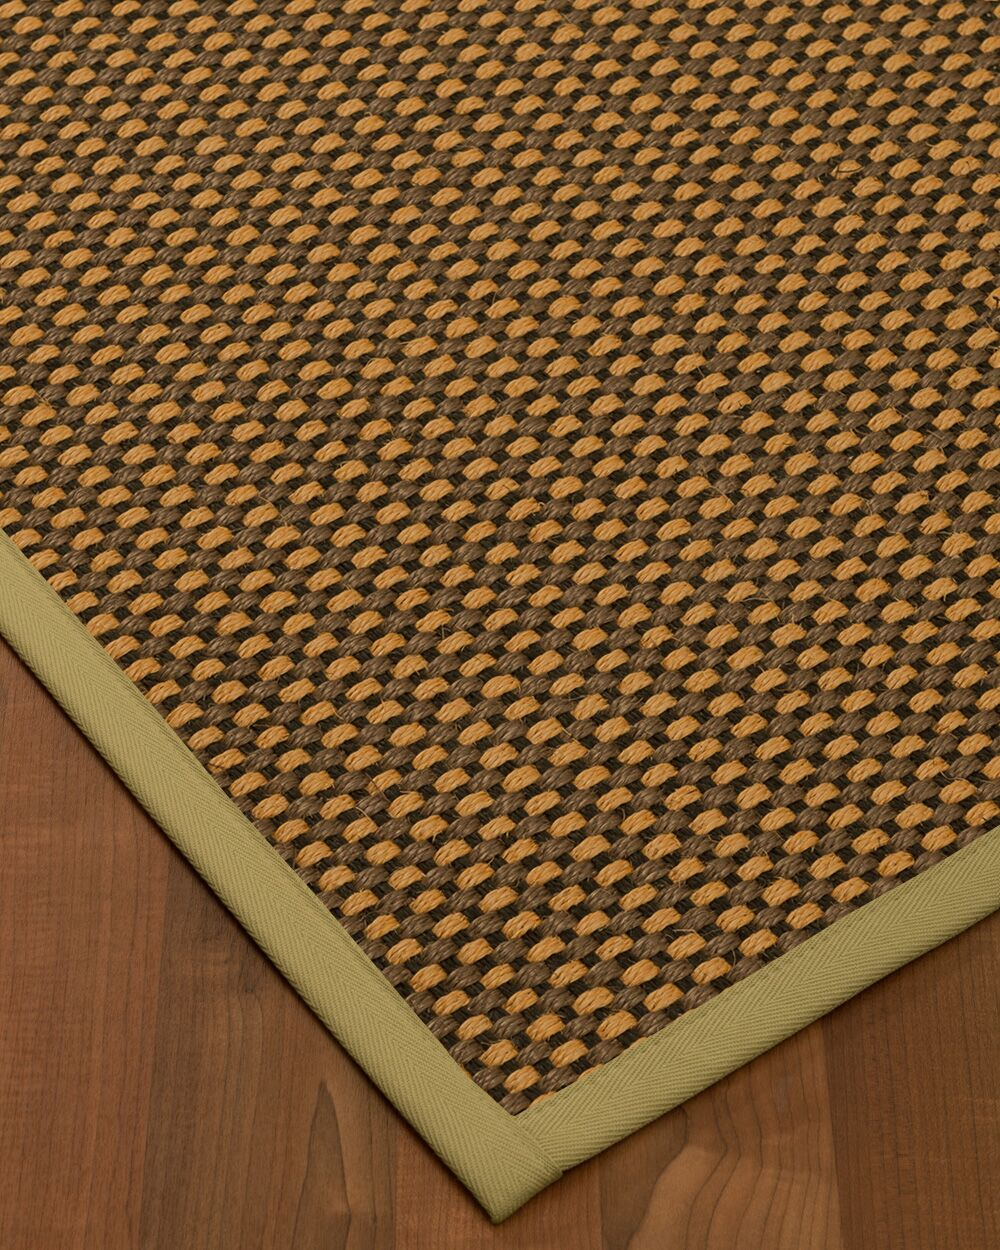 Kimbrel Hand-Woven Brown Area Rug Rug Size: Runner 2'5